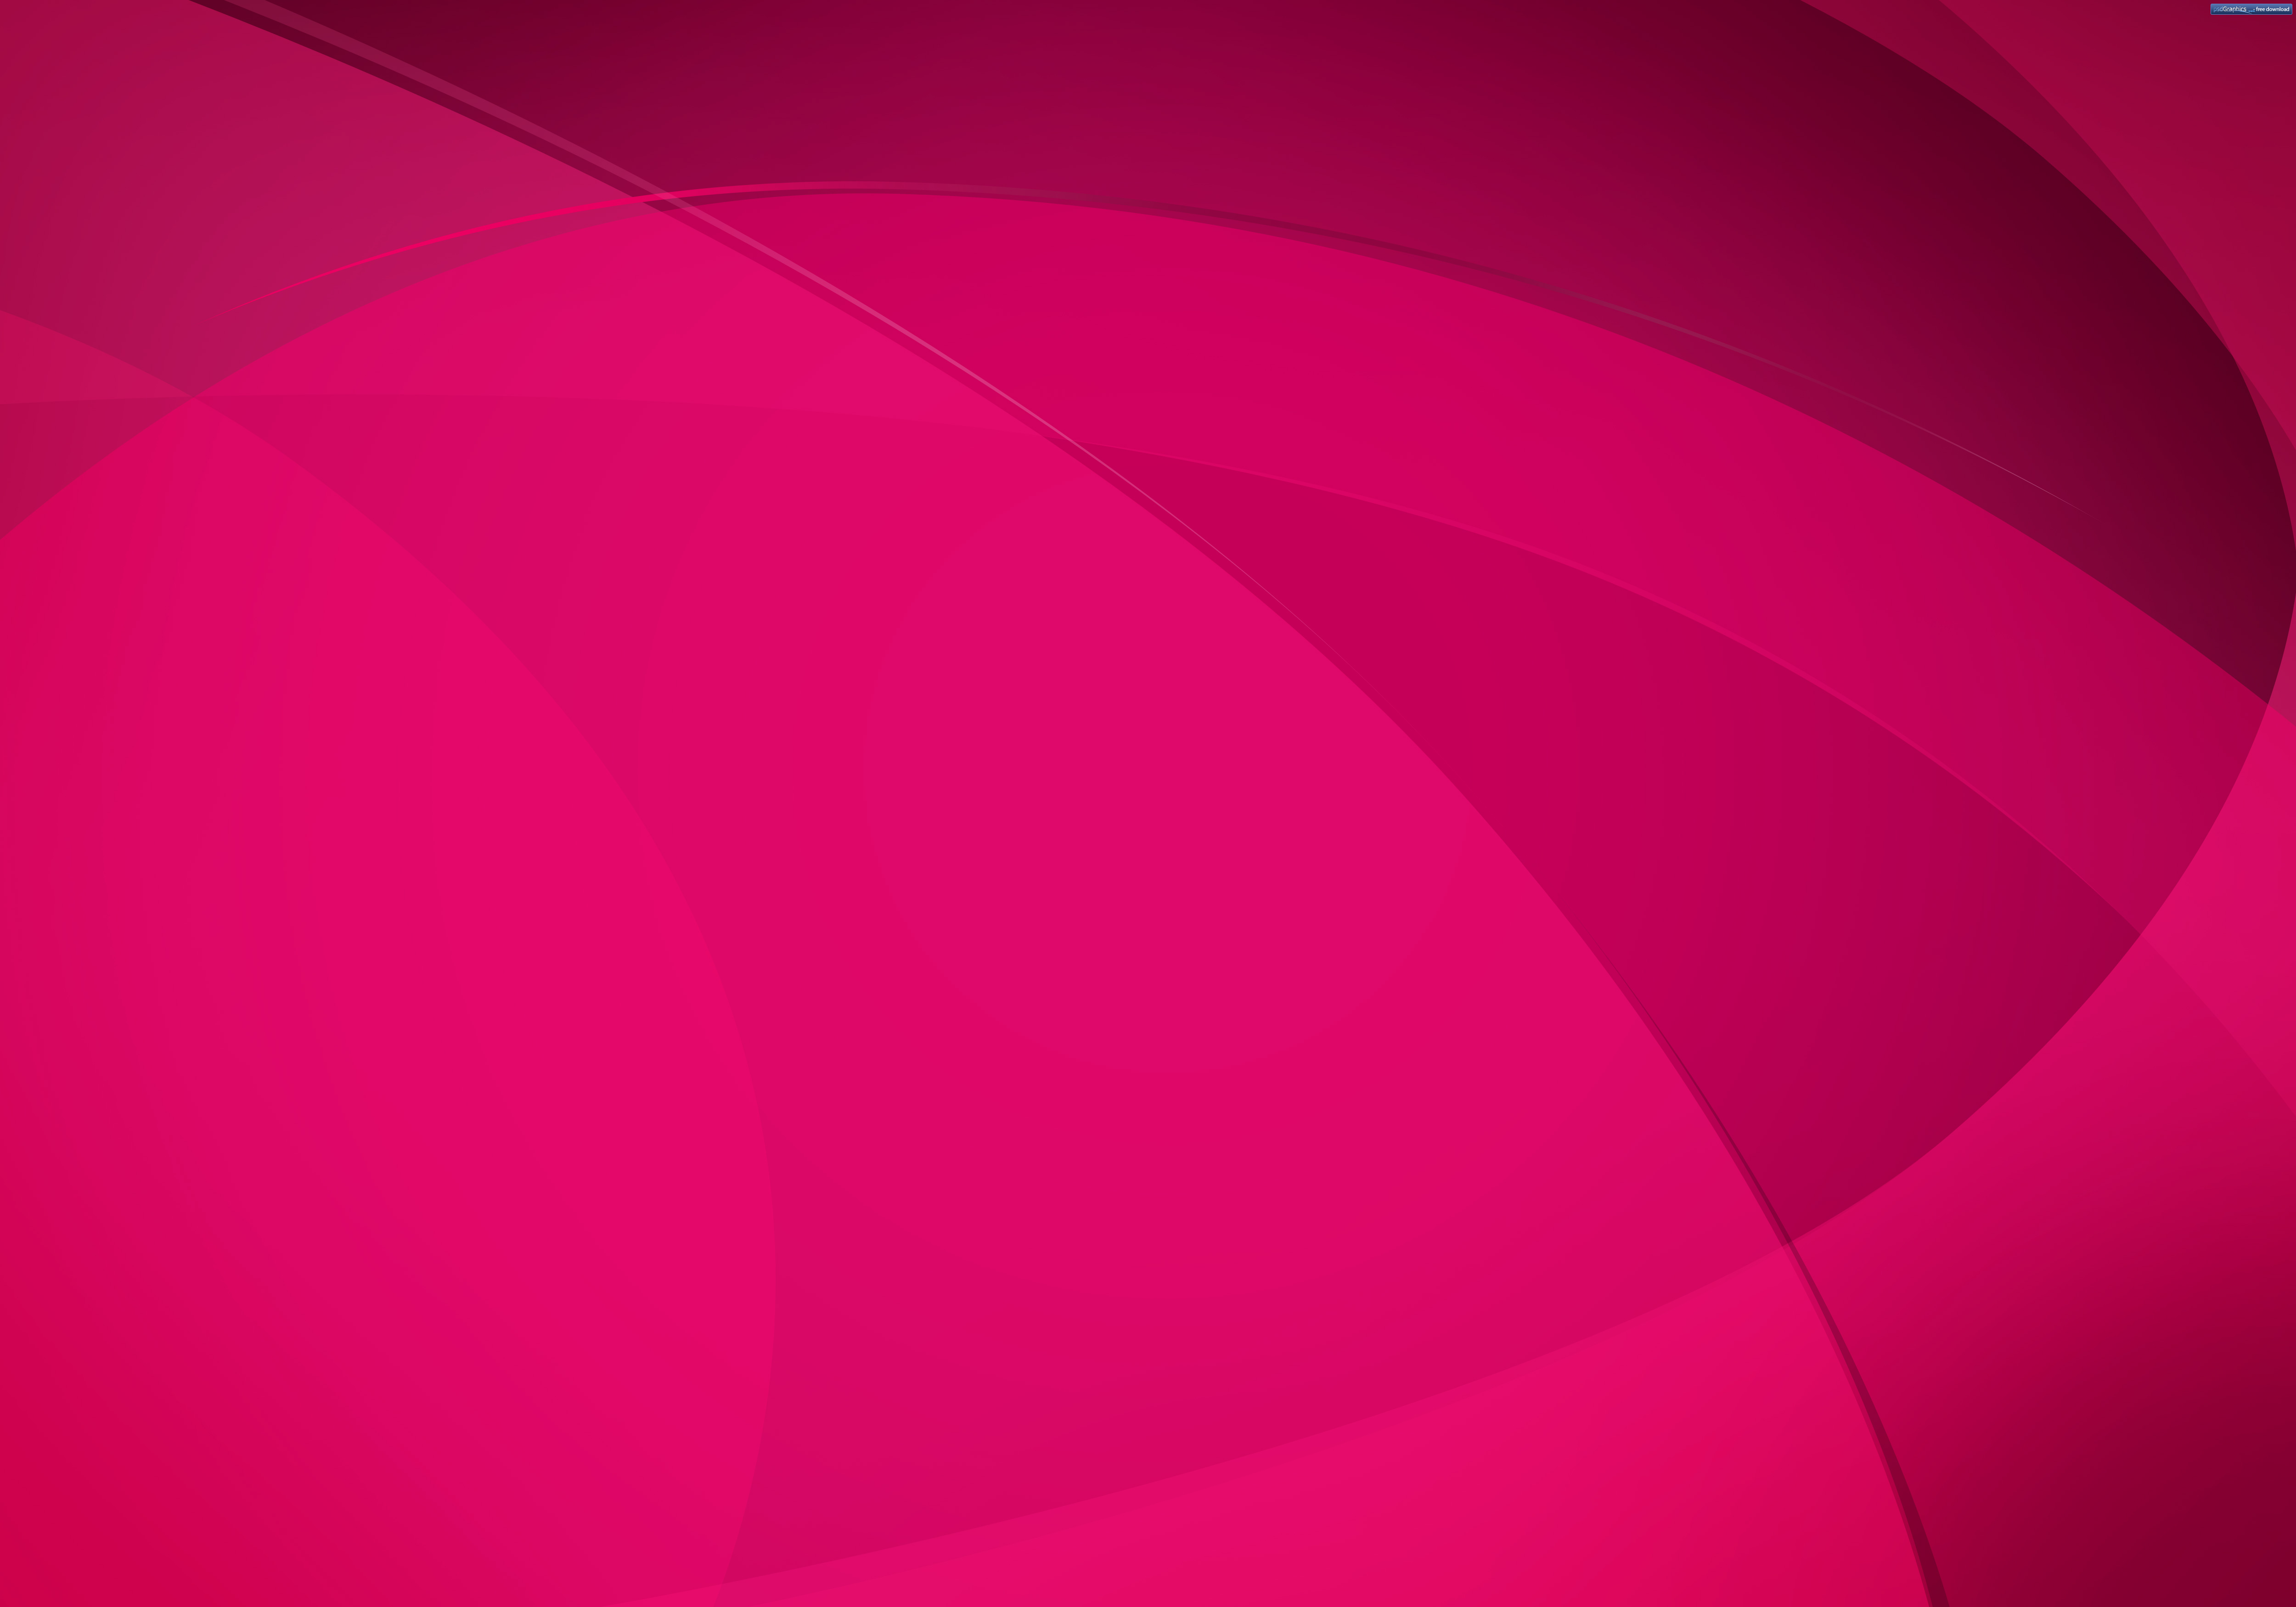 pink background 5000x3500